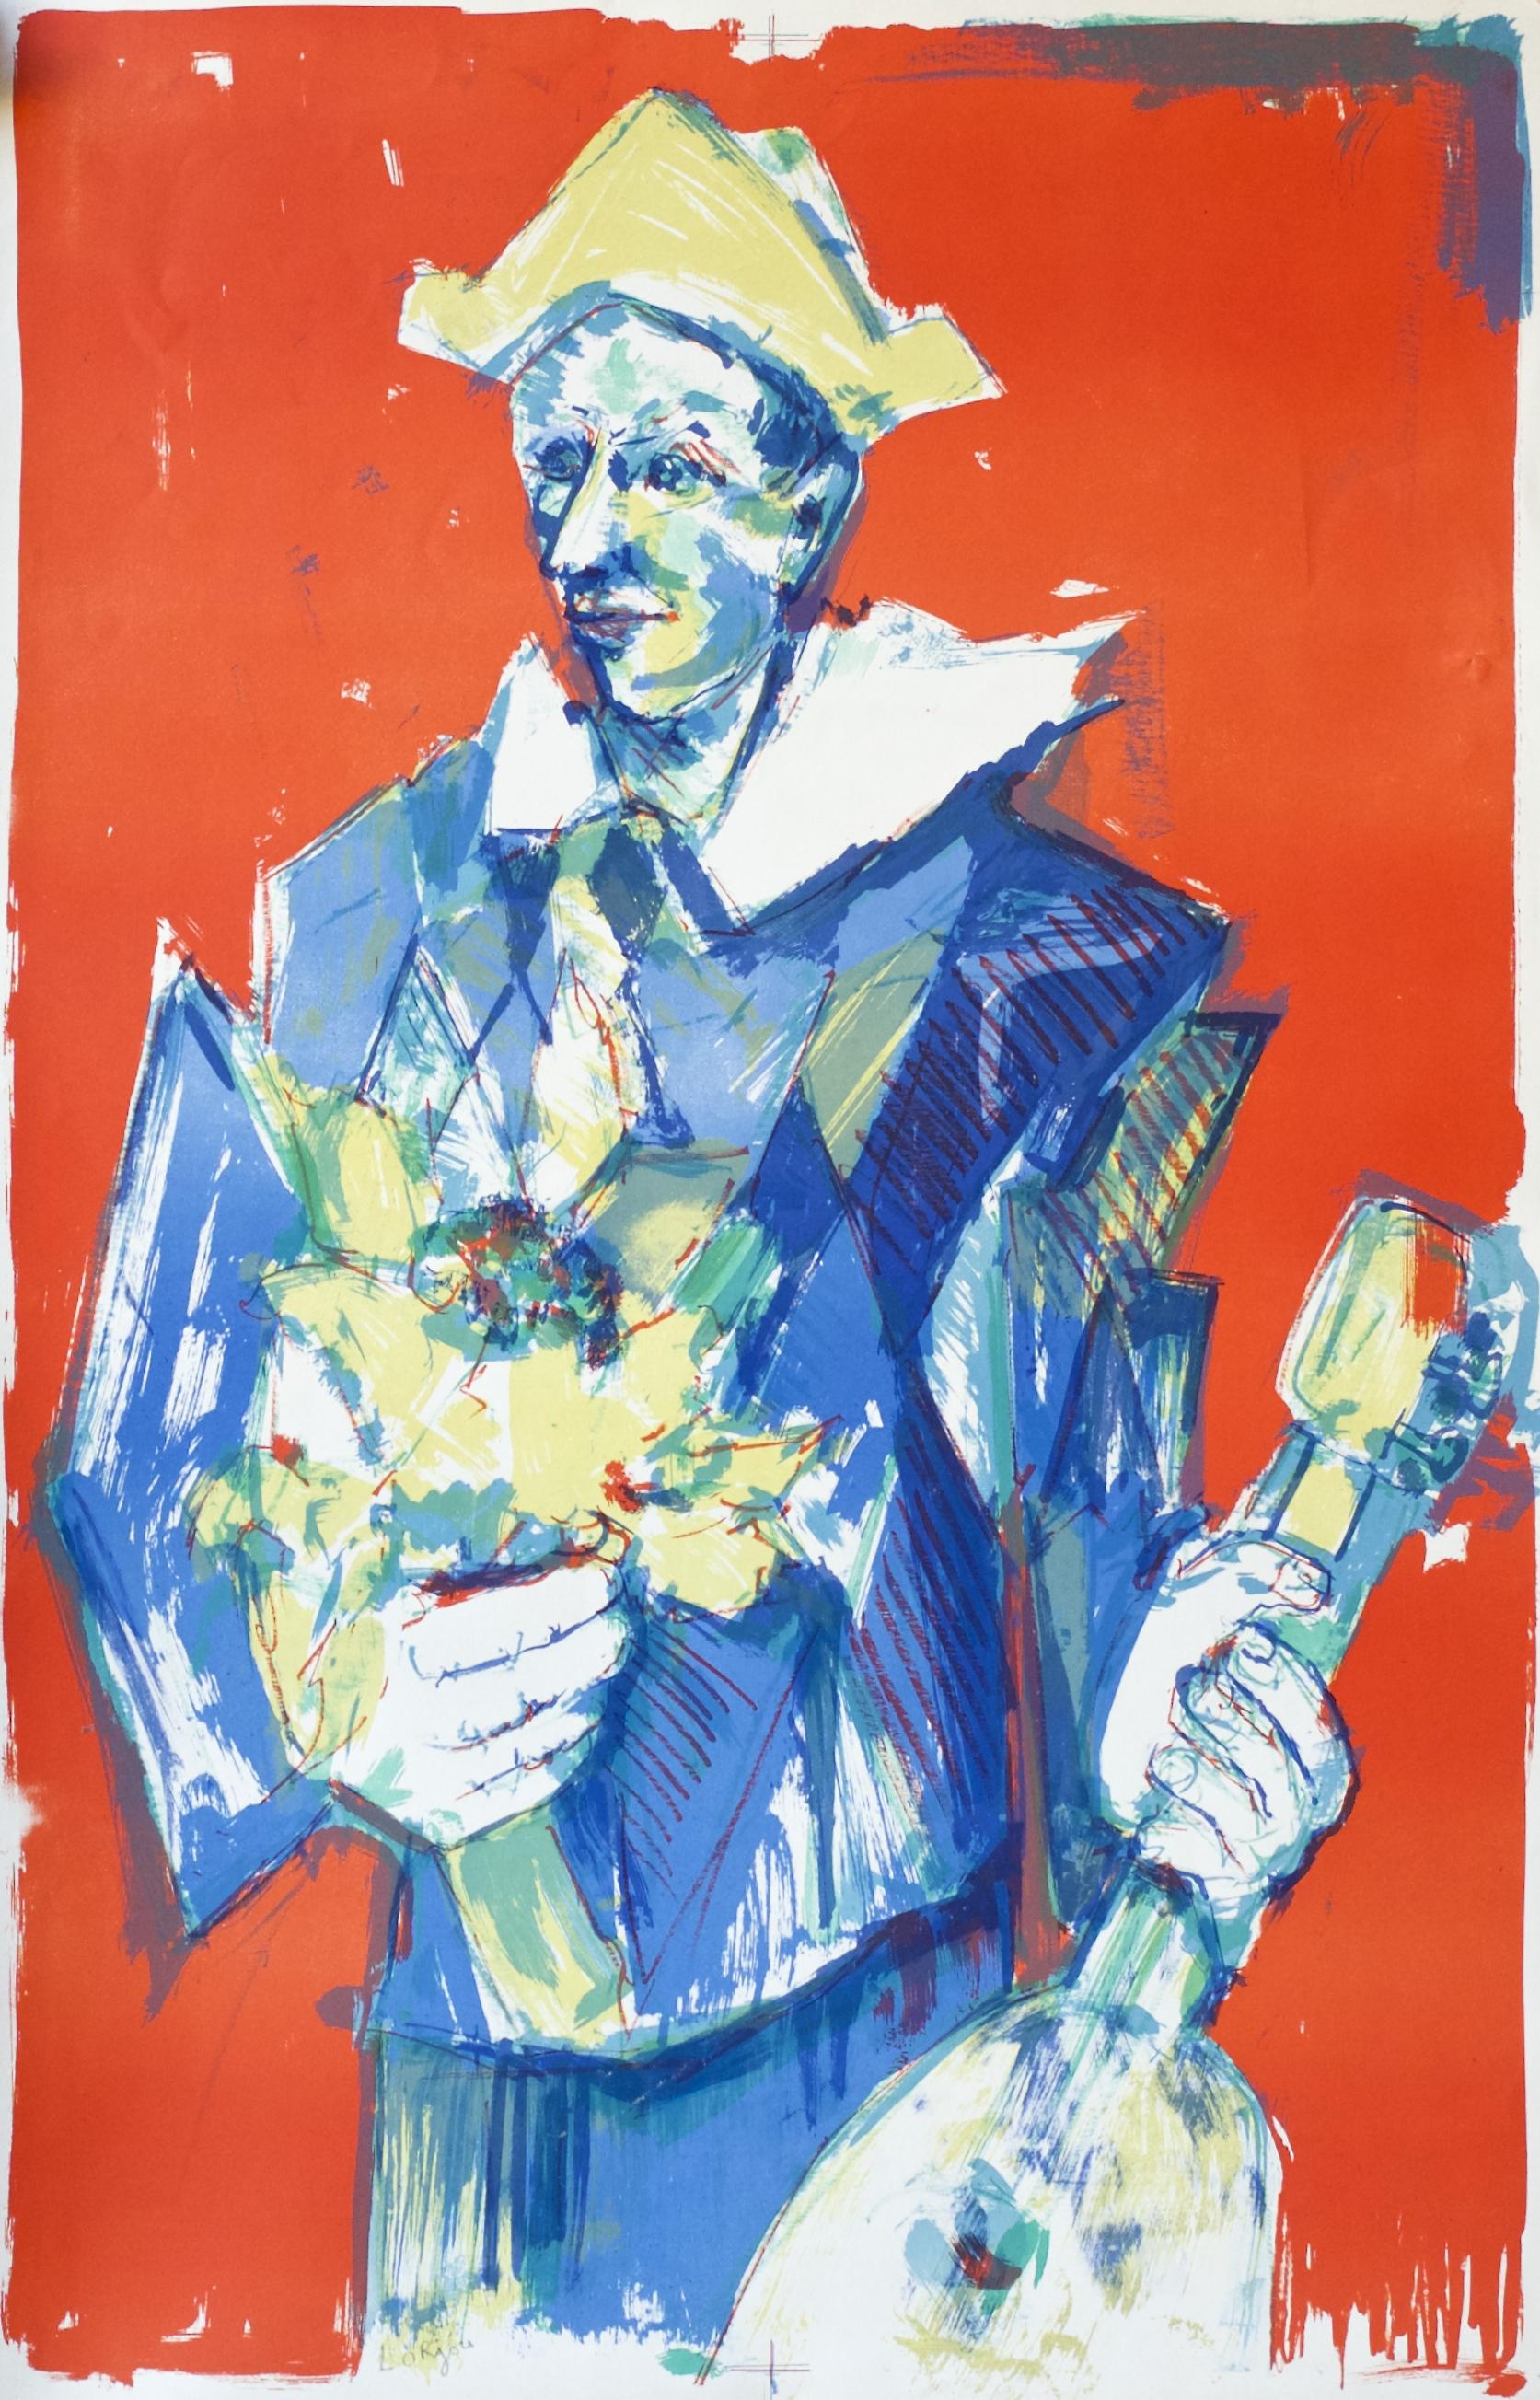 Harlequin, Guitar and Flower (Arlequin, Guitare et Fleur) (1959)